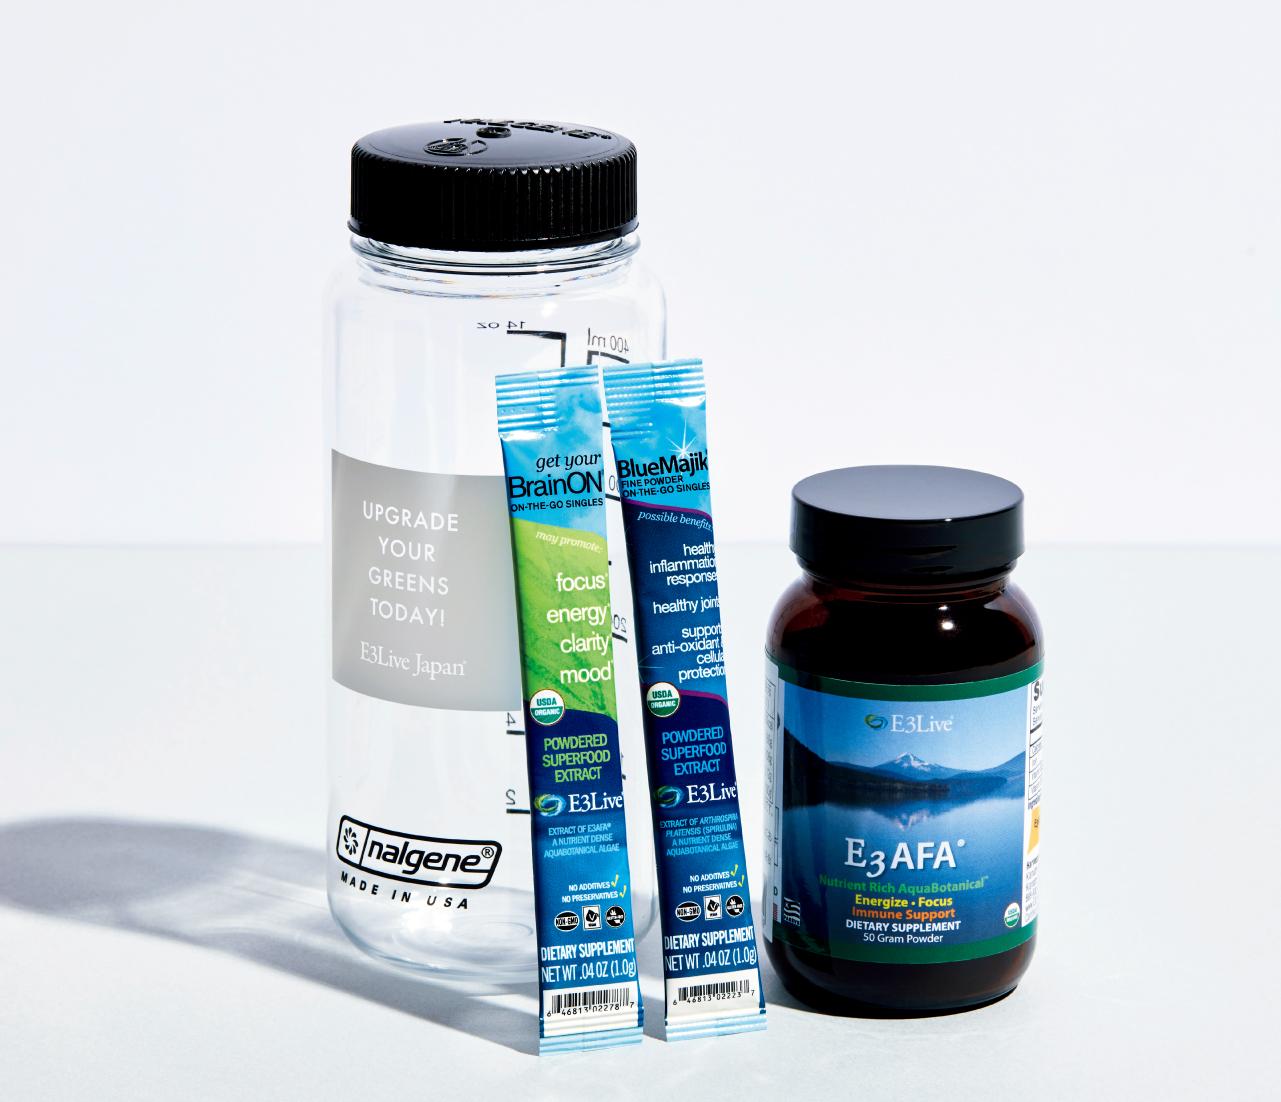 AFAパウダー(朝食置き換え用のブルーグリーンアルジーパウダー)1瓶、BlueMajikパウダースティック(スピルリナ抽出物)5本、BrainONパウダースティック(ブルーグリーンアルジー抽出物)5本、E3Live オリジナル ナルゲンボトル、プログラムガイド ¥16,200/イースリーライブジャパン